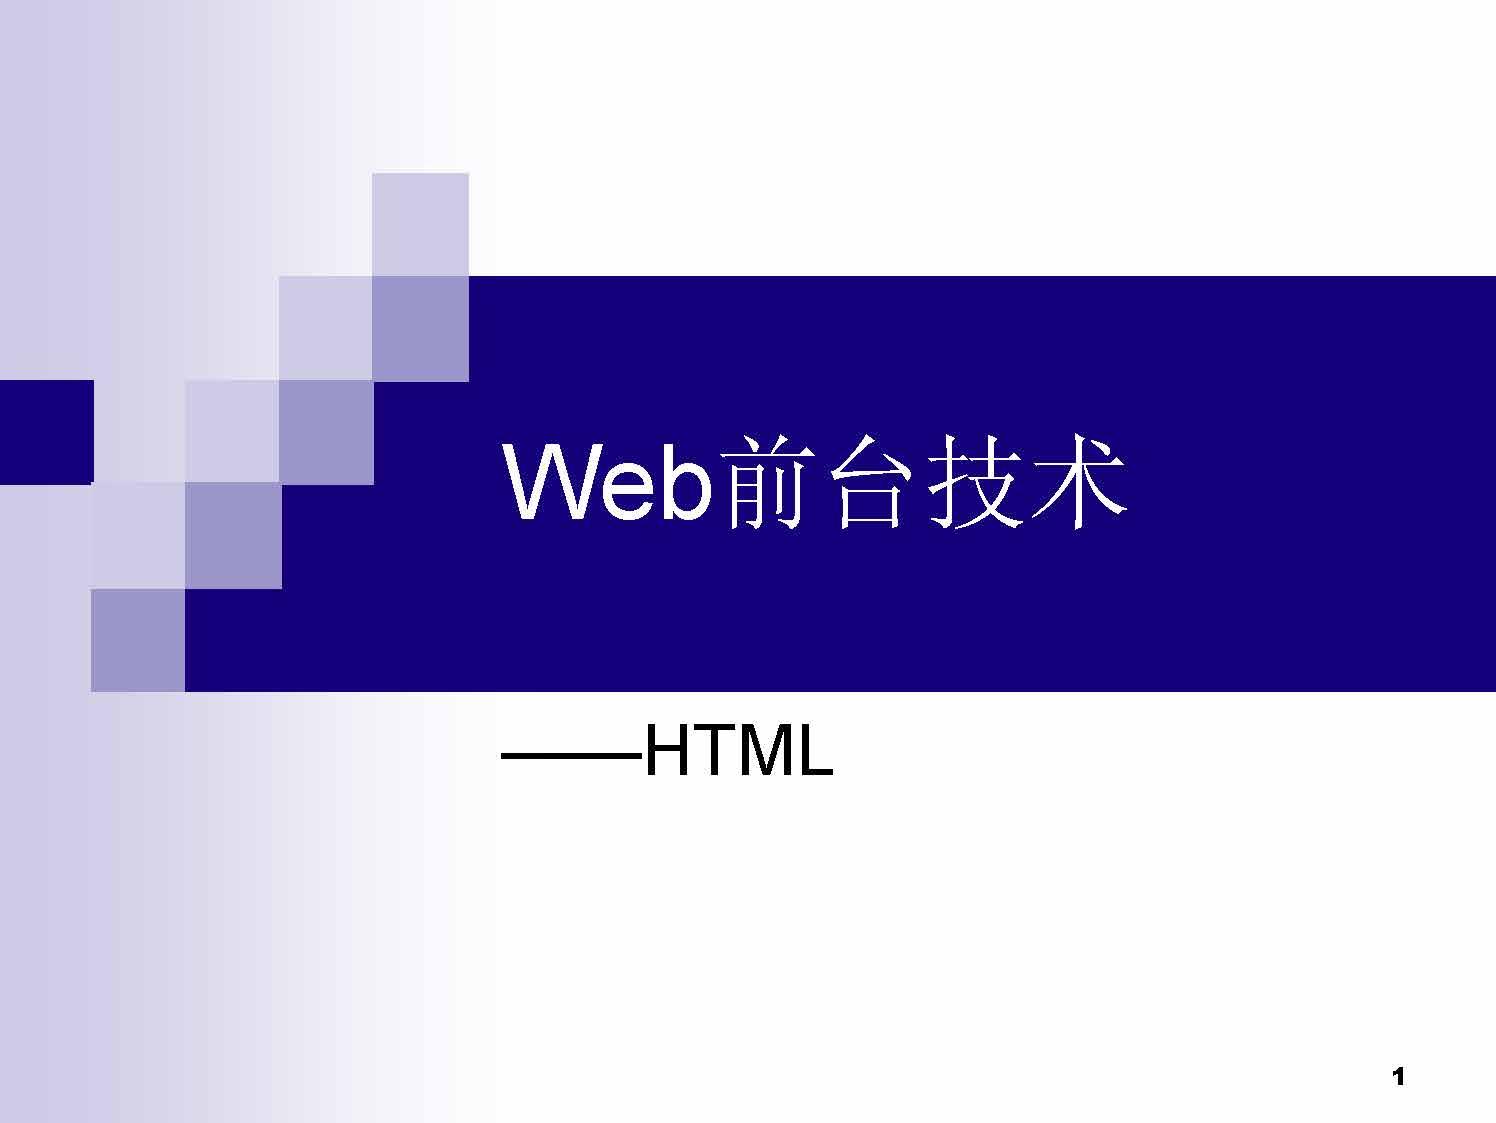 Web前台技术-HTML